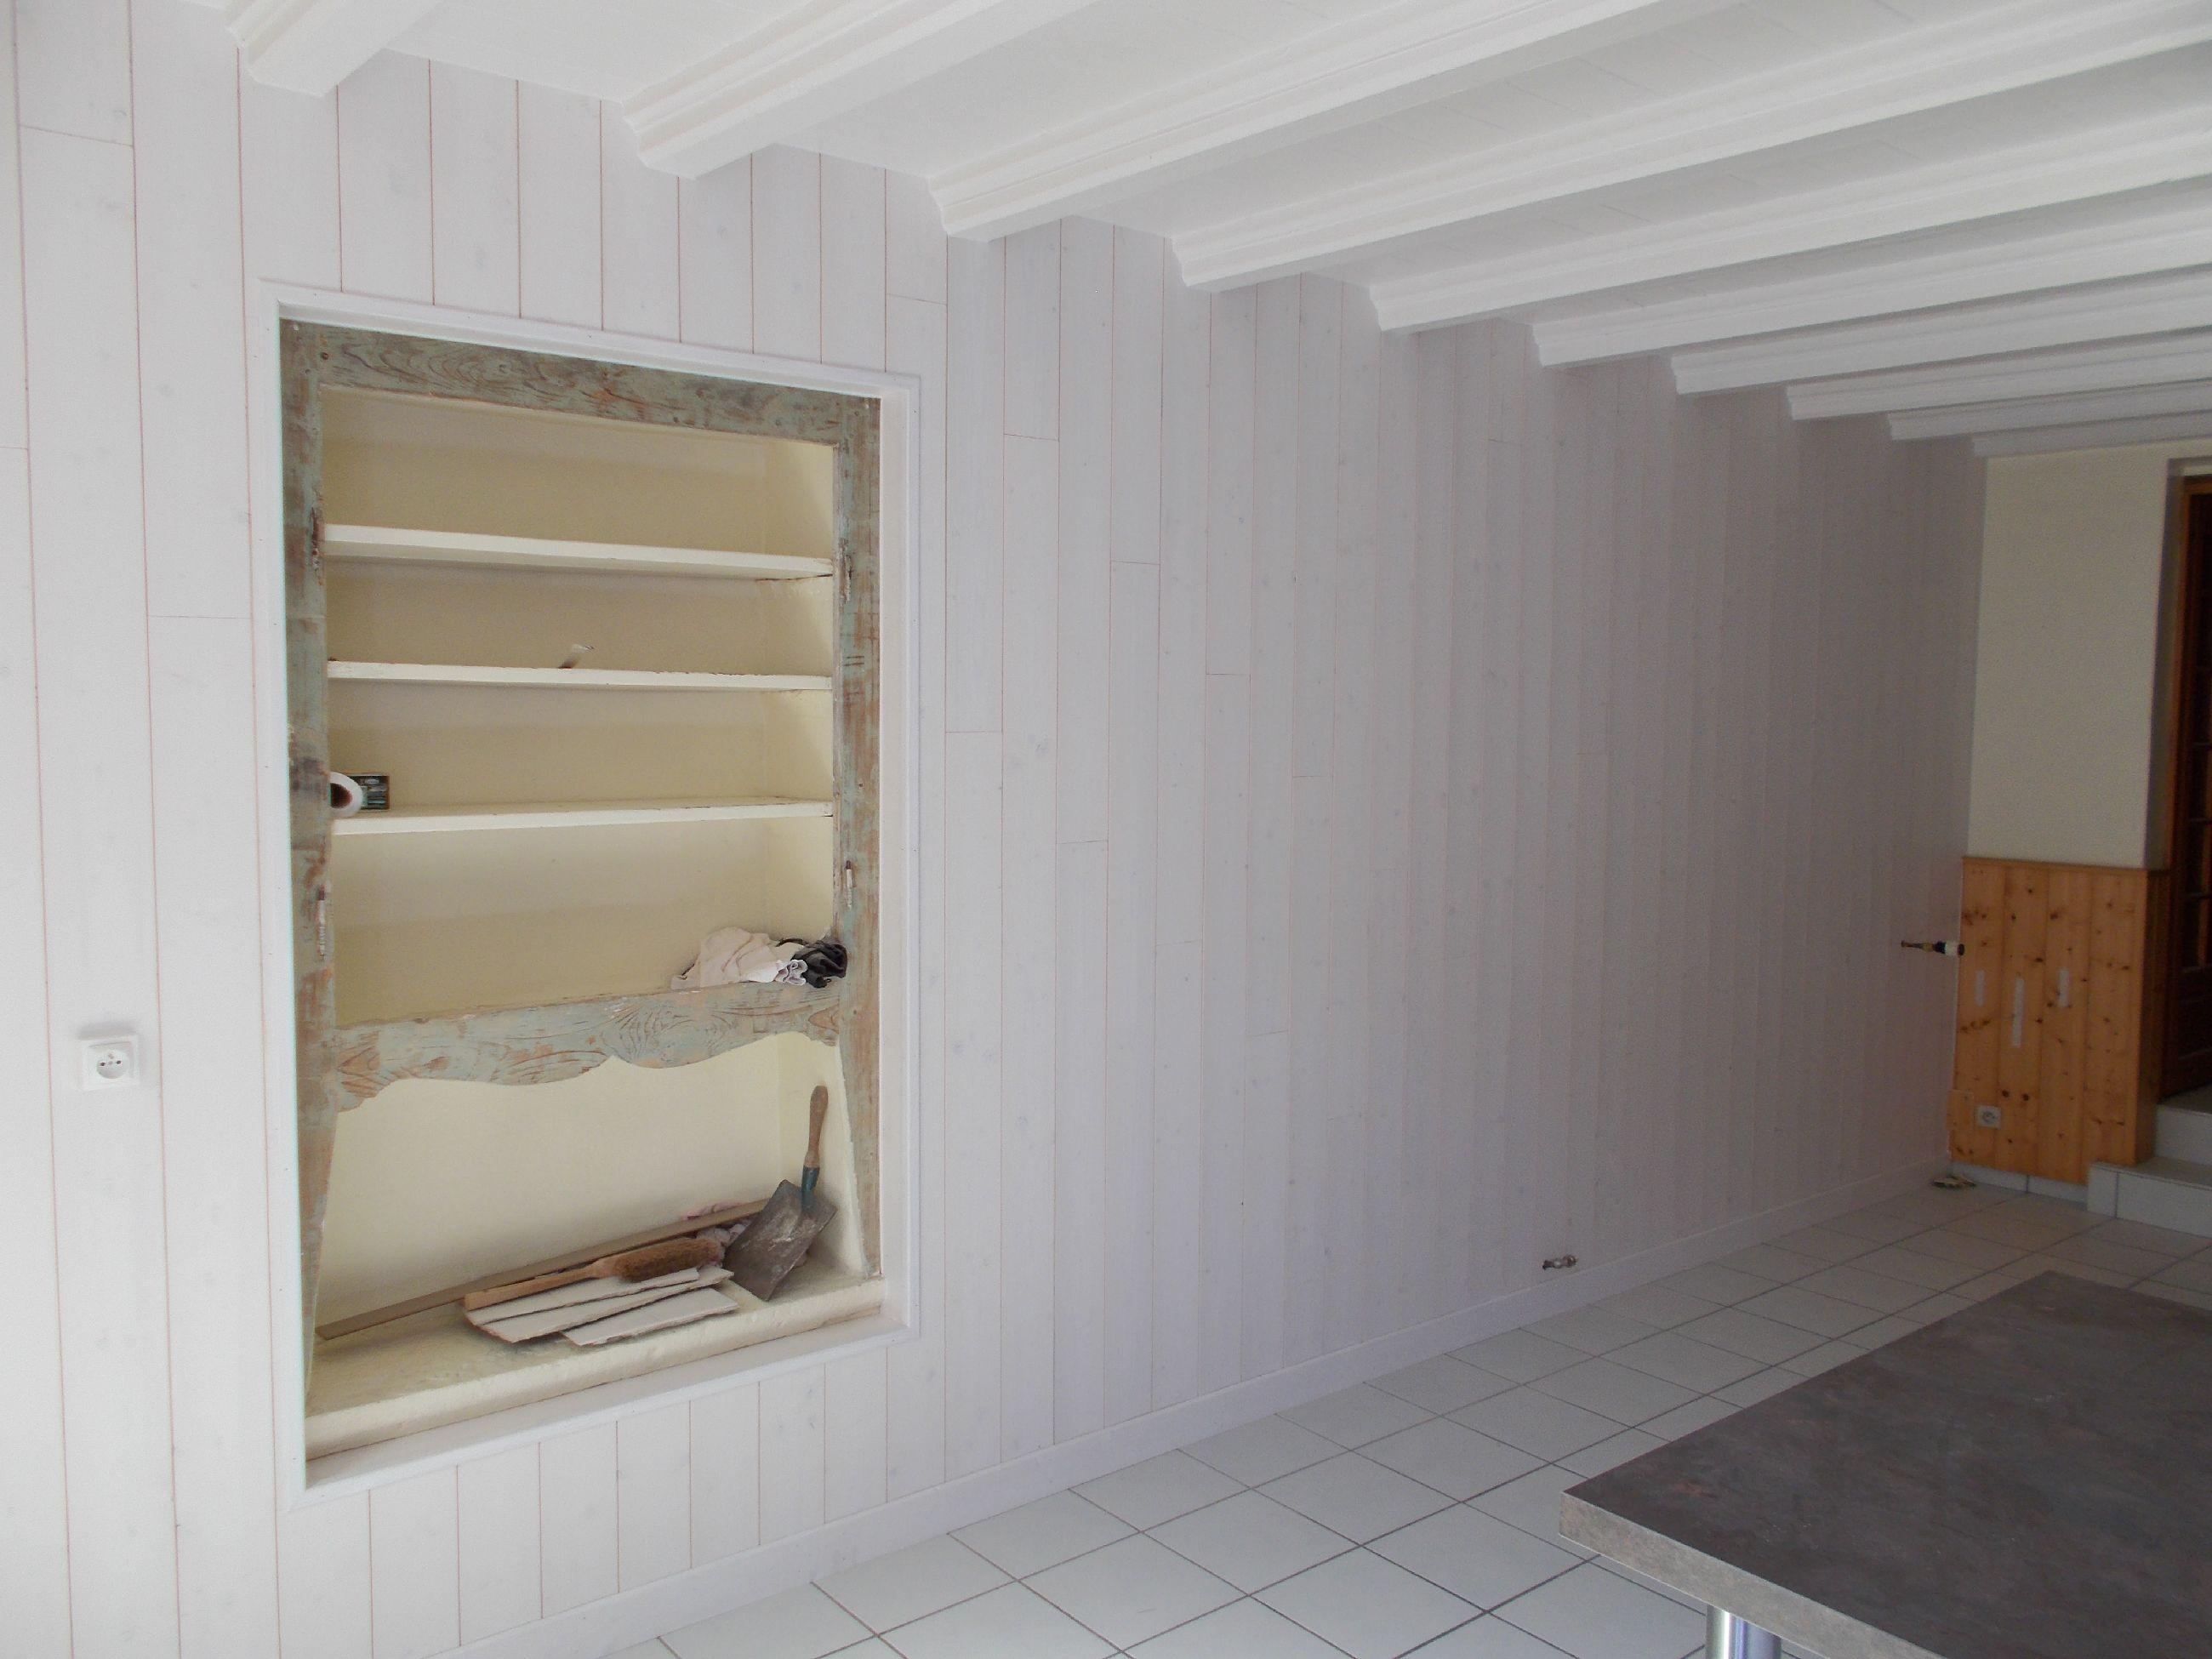 isolation interieure. Black Bedroom Furniture Sets. Home Design Ideas